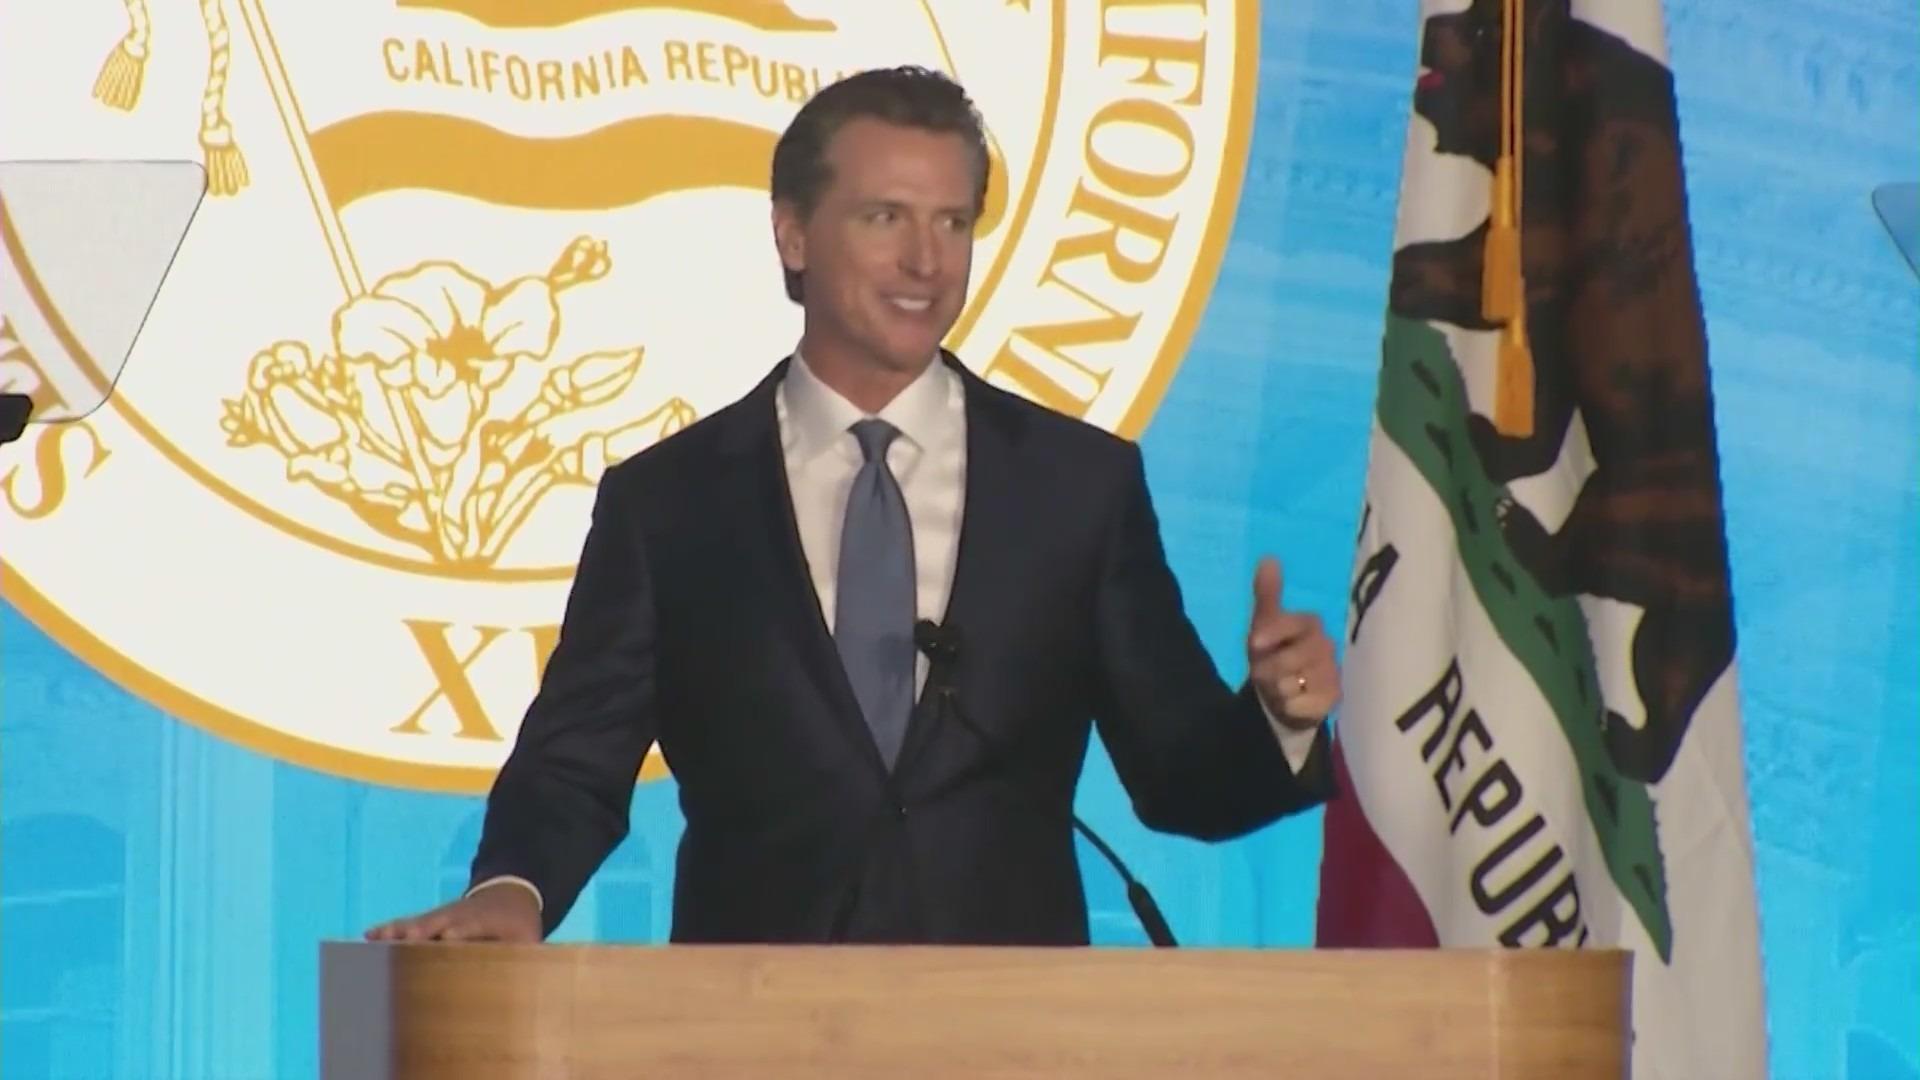 Gov. Gavin Newsom, shown in this undated photo, faces the voters on Sept. 14, 2021. (KTLA)